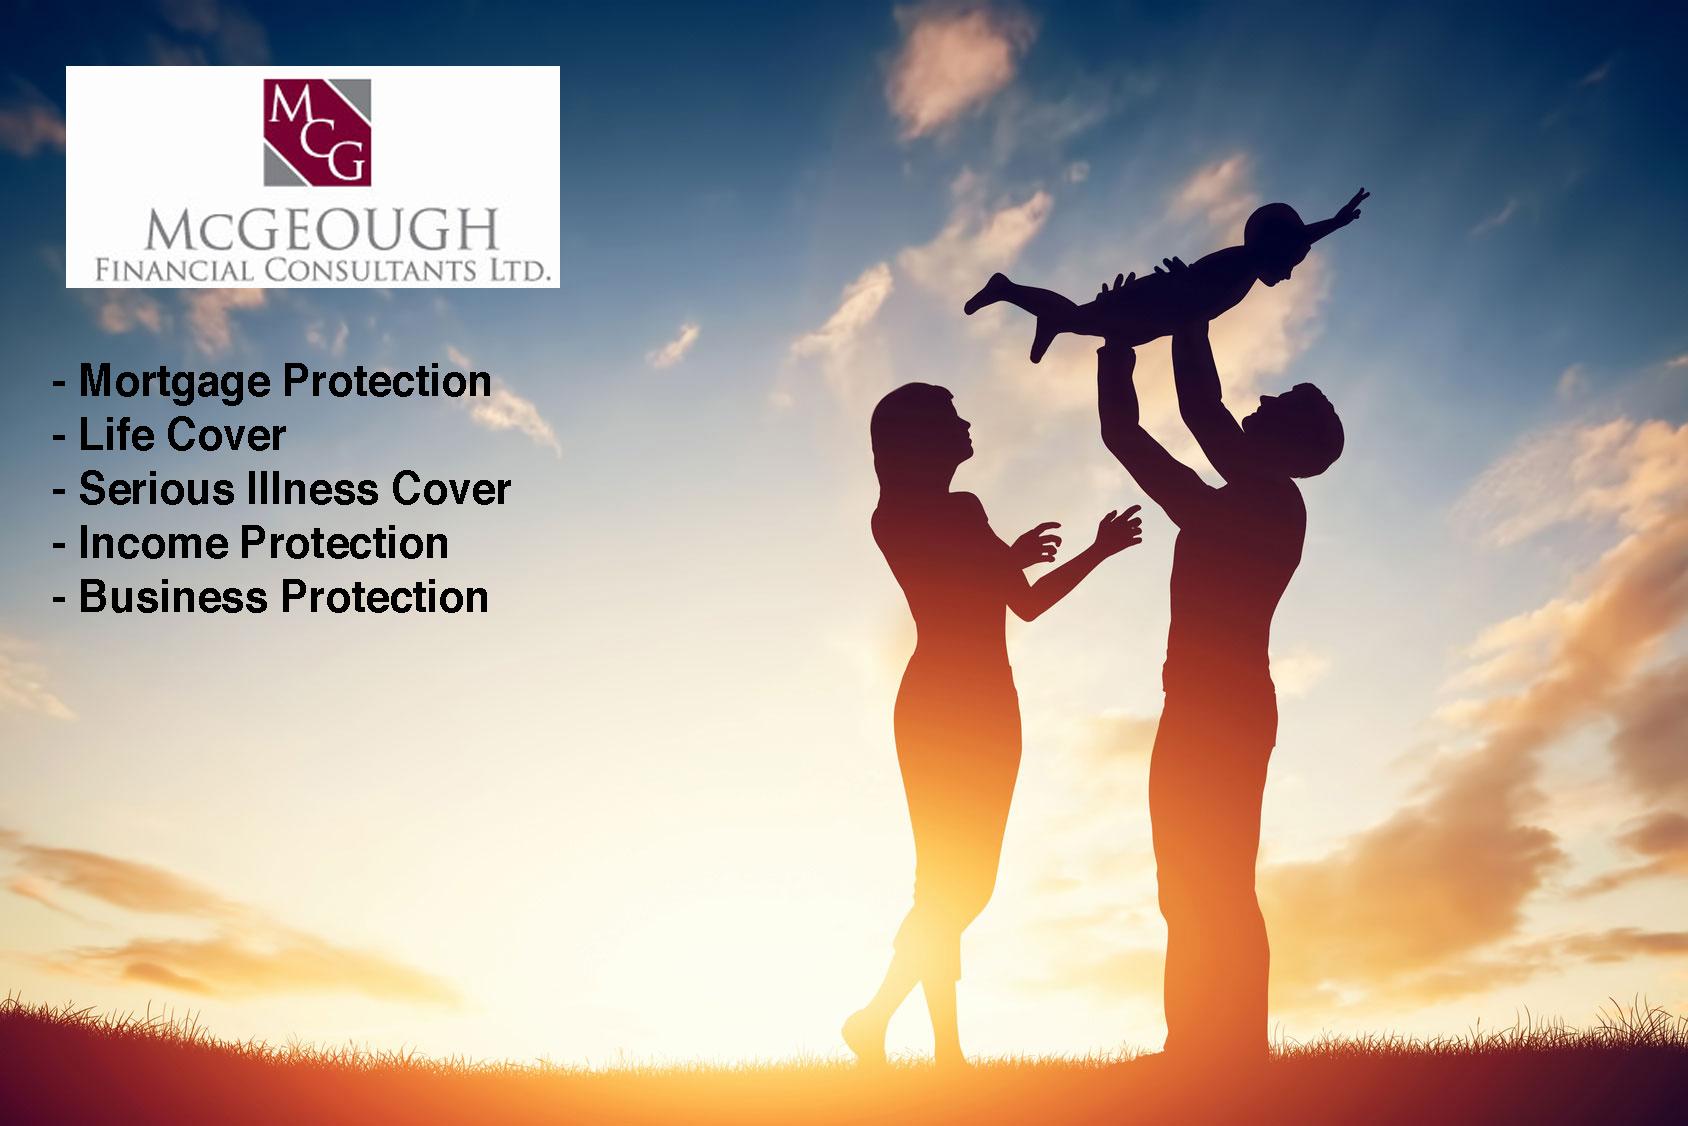 Life Insurance McGeough Financial